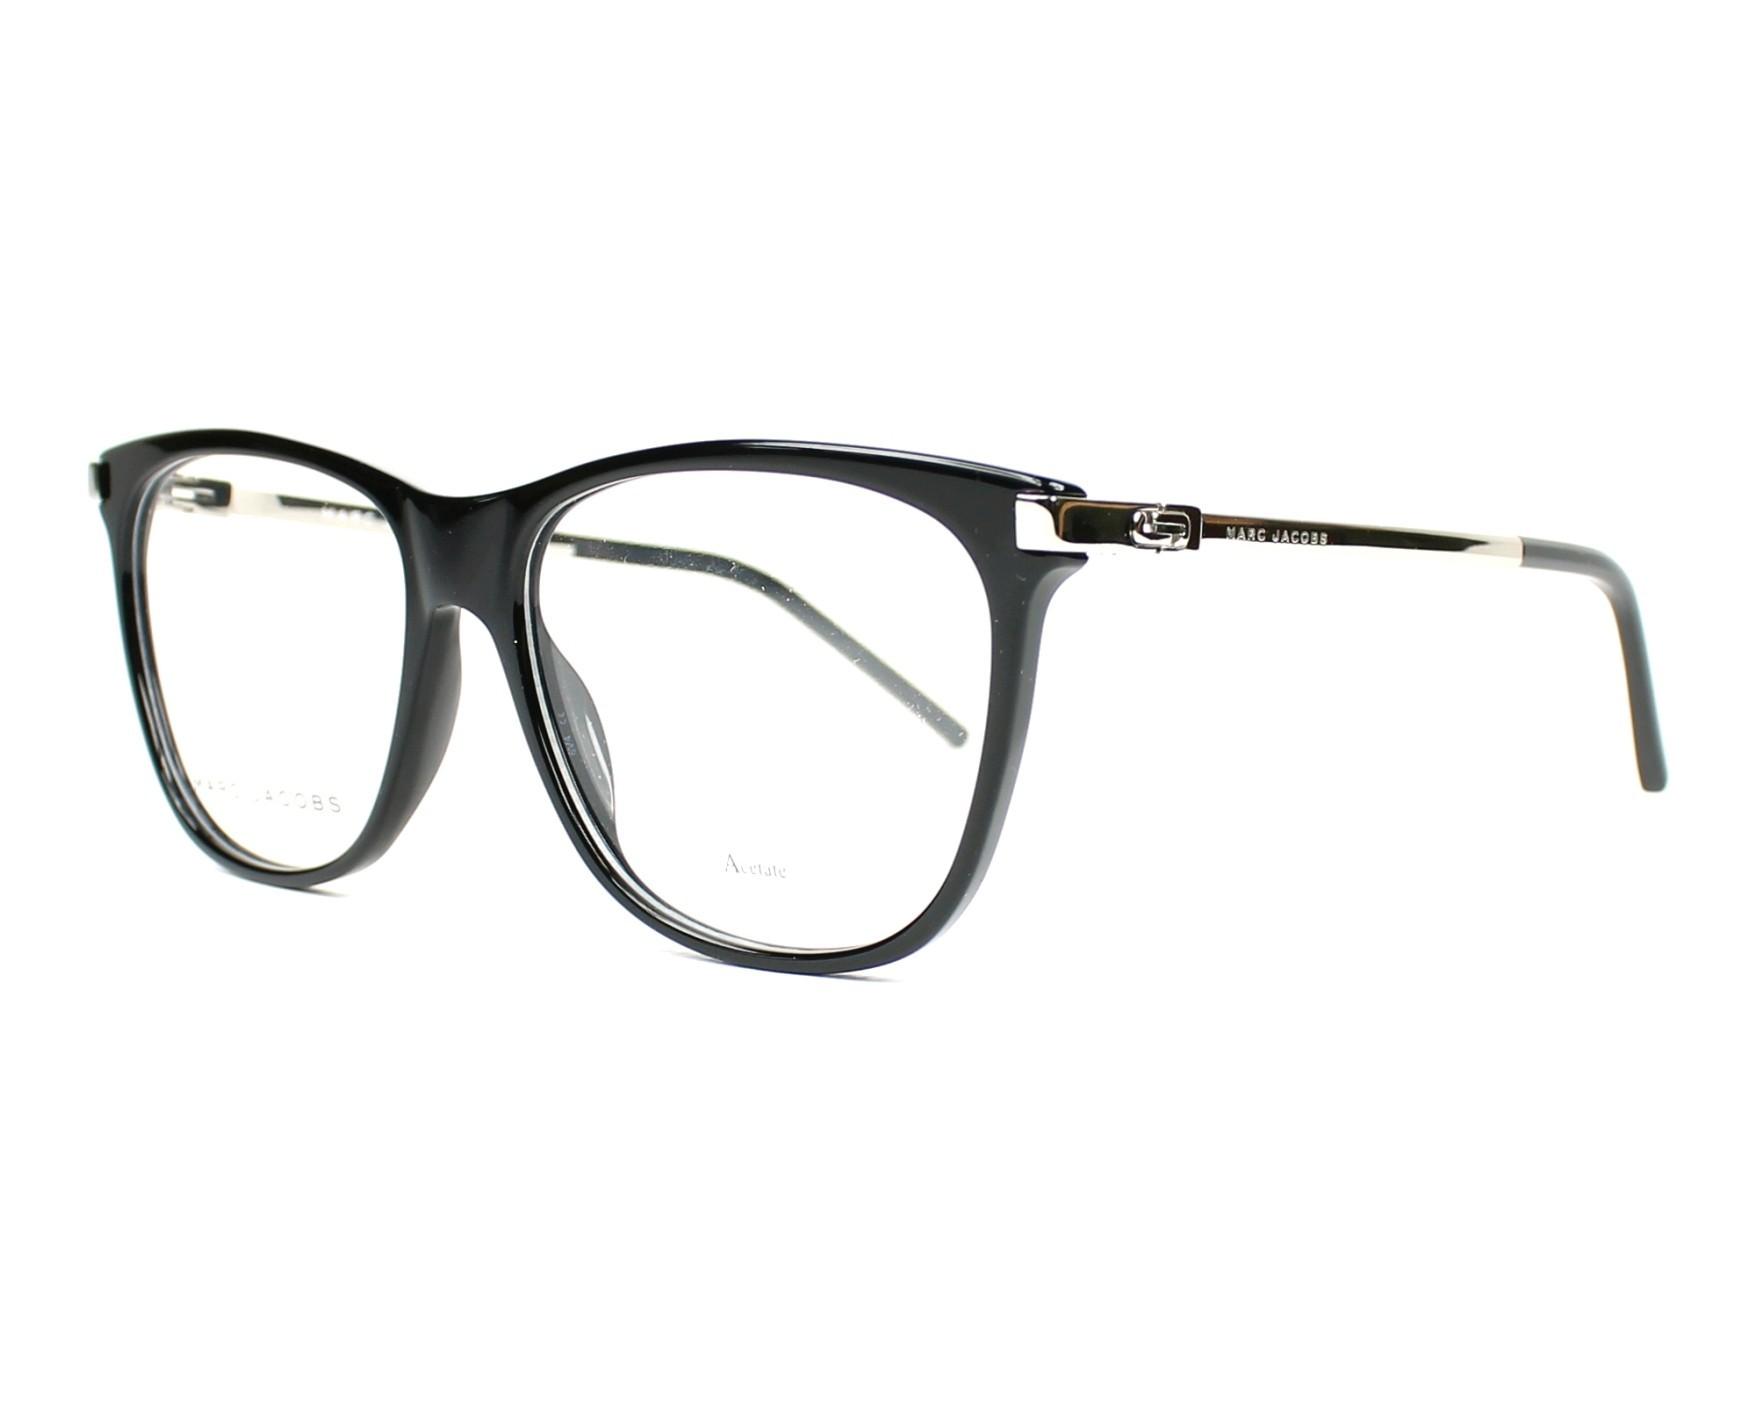 Marc Jacobs Brille MARC-144 CSA schwarz  Visionet